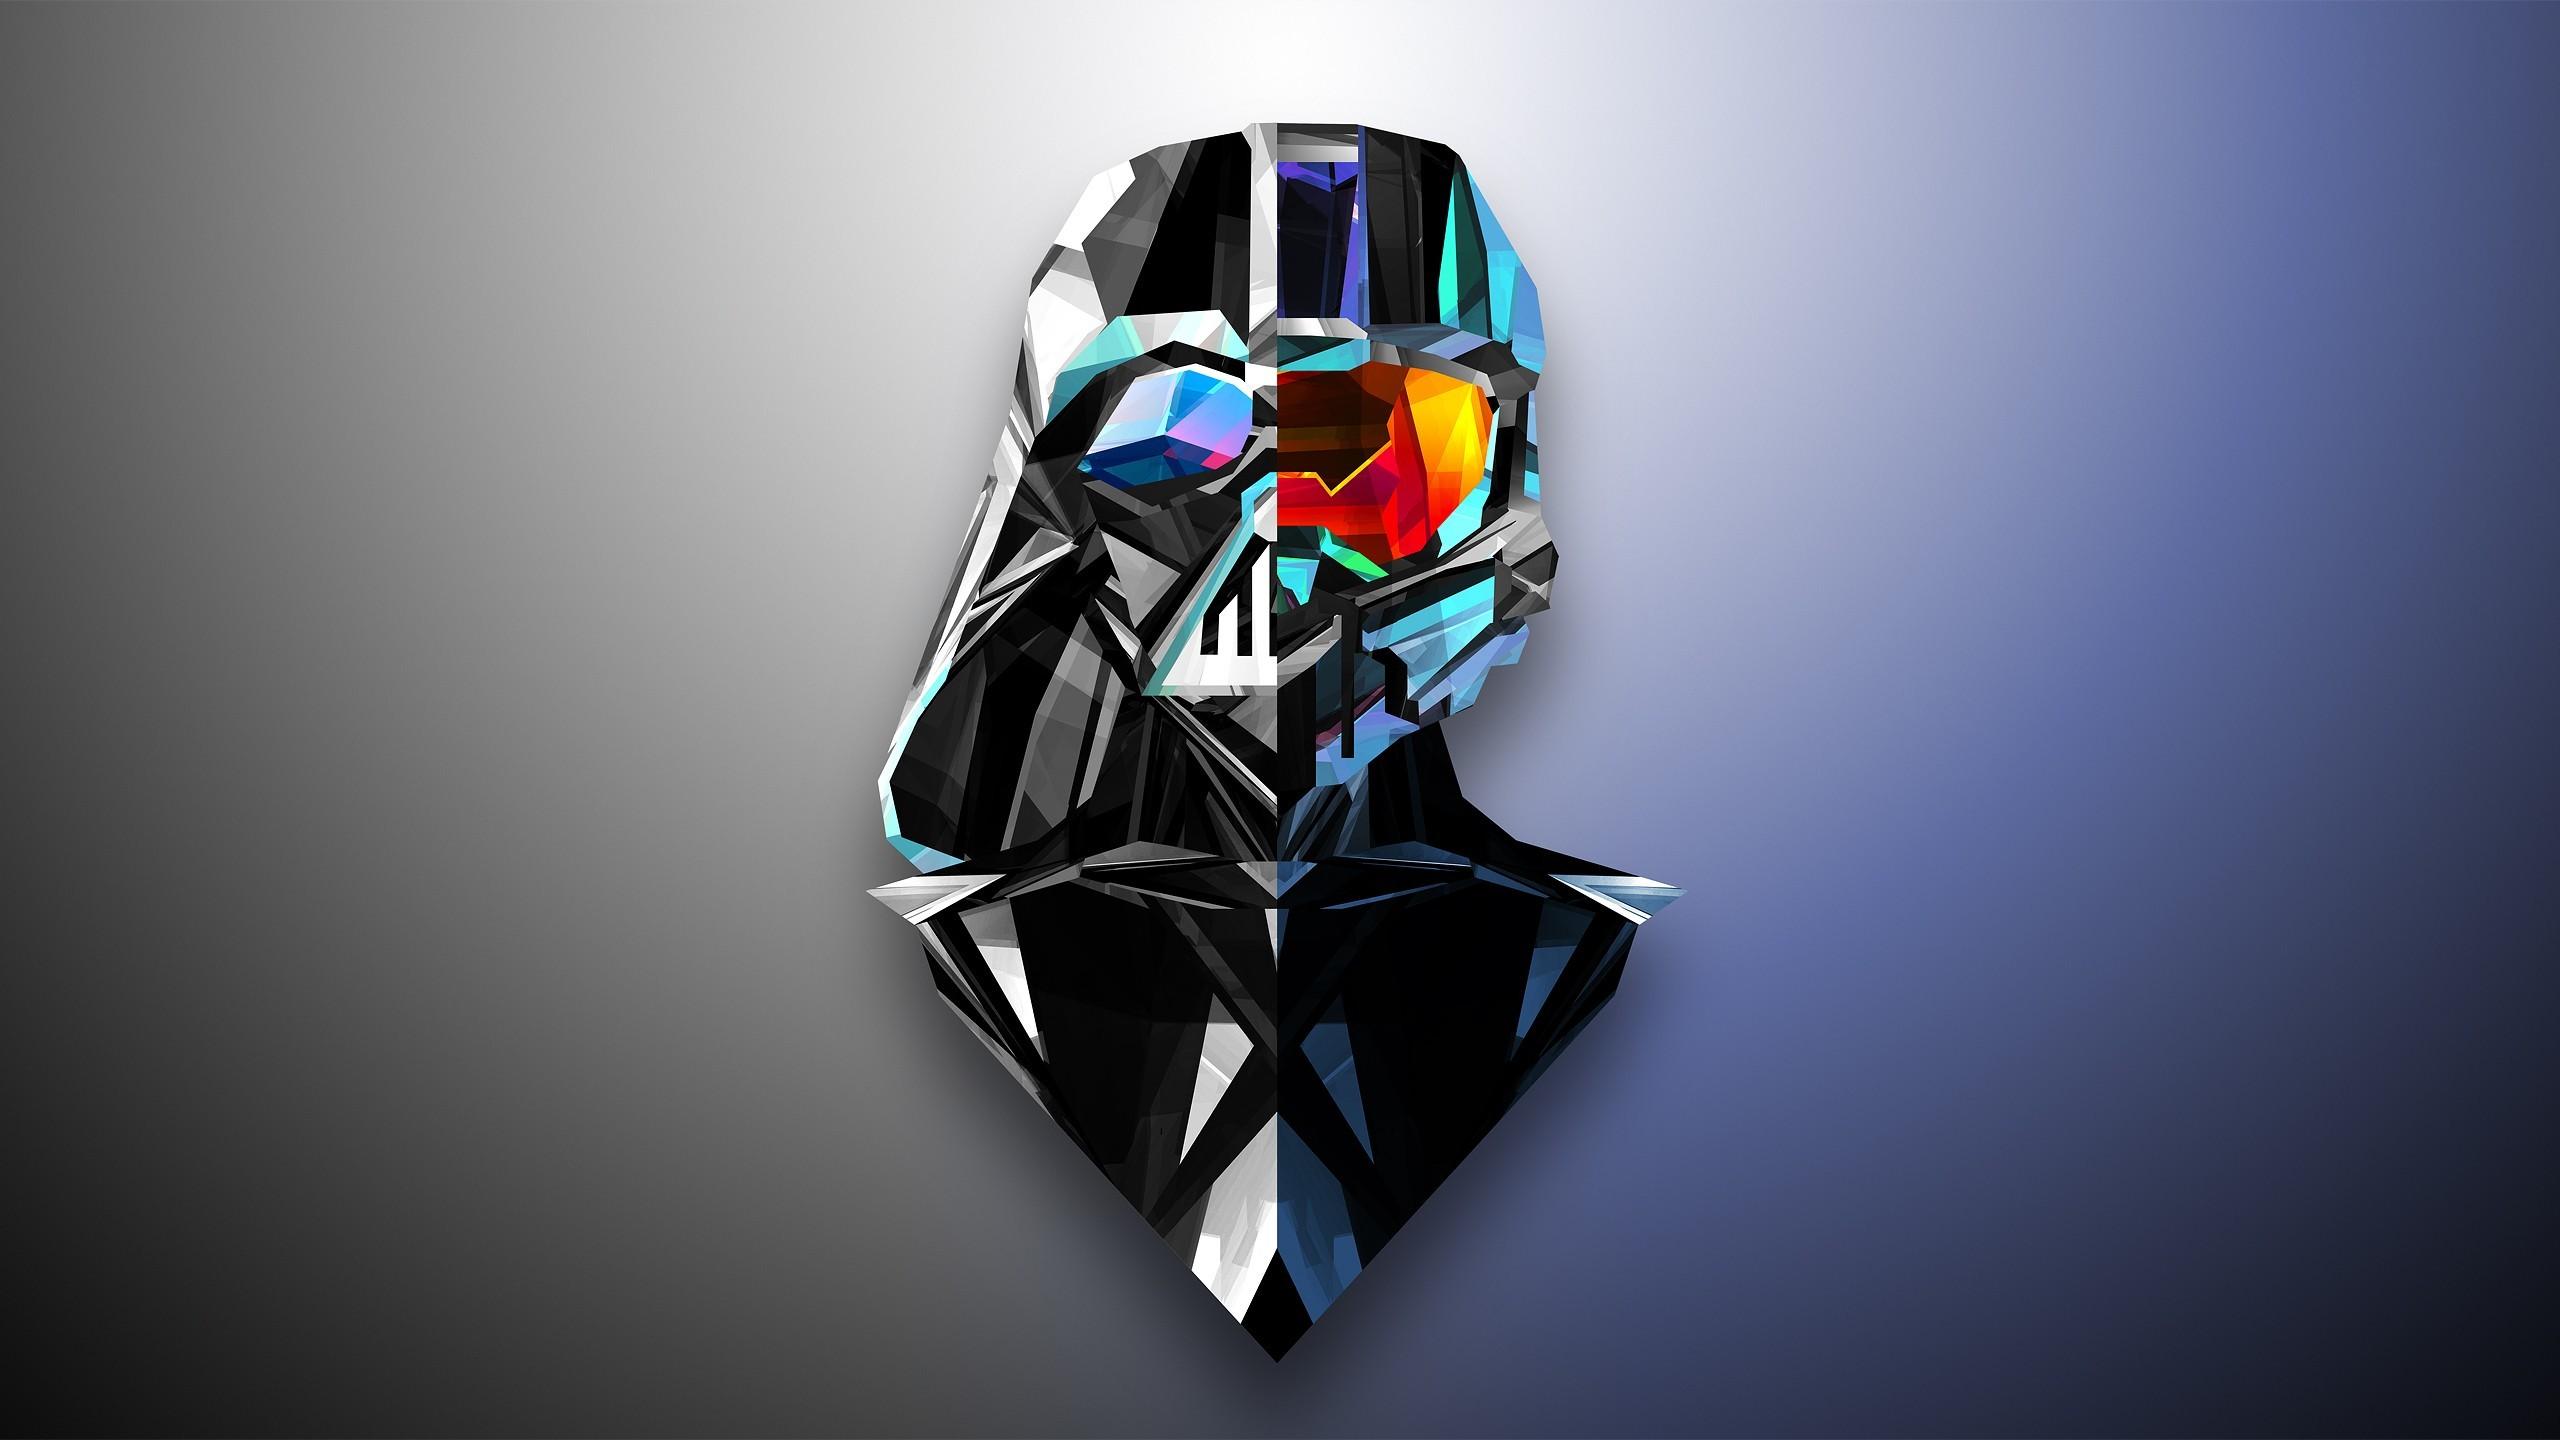 Justin Maller, abstract, low poly, Halo, Darth Vader, Master Chief